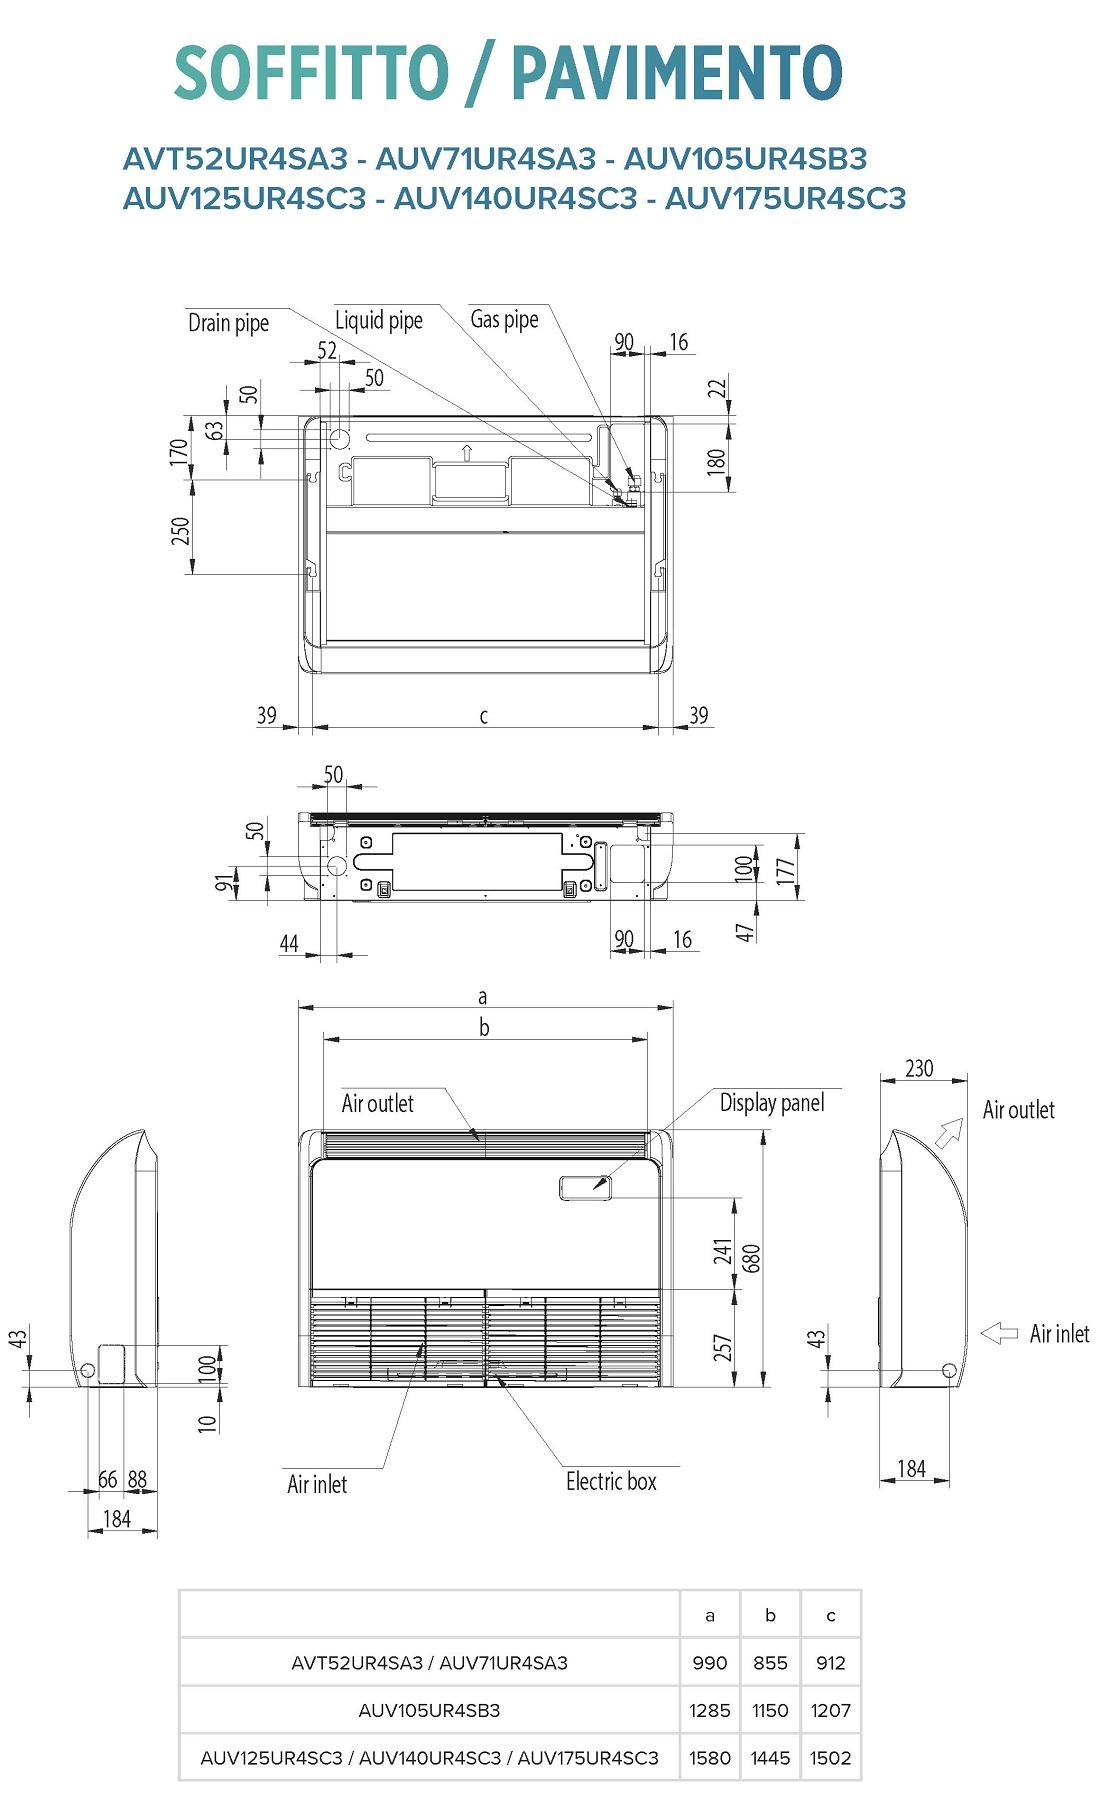 Condizionatore Hisense Commerciale 42000 Btu AUV125UR4 TRIFASE